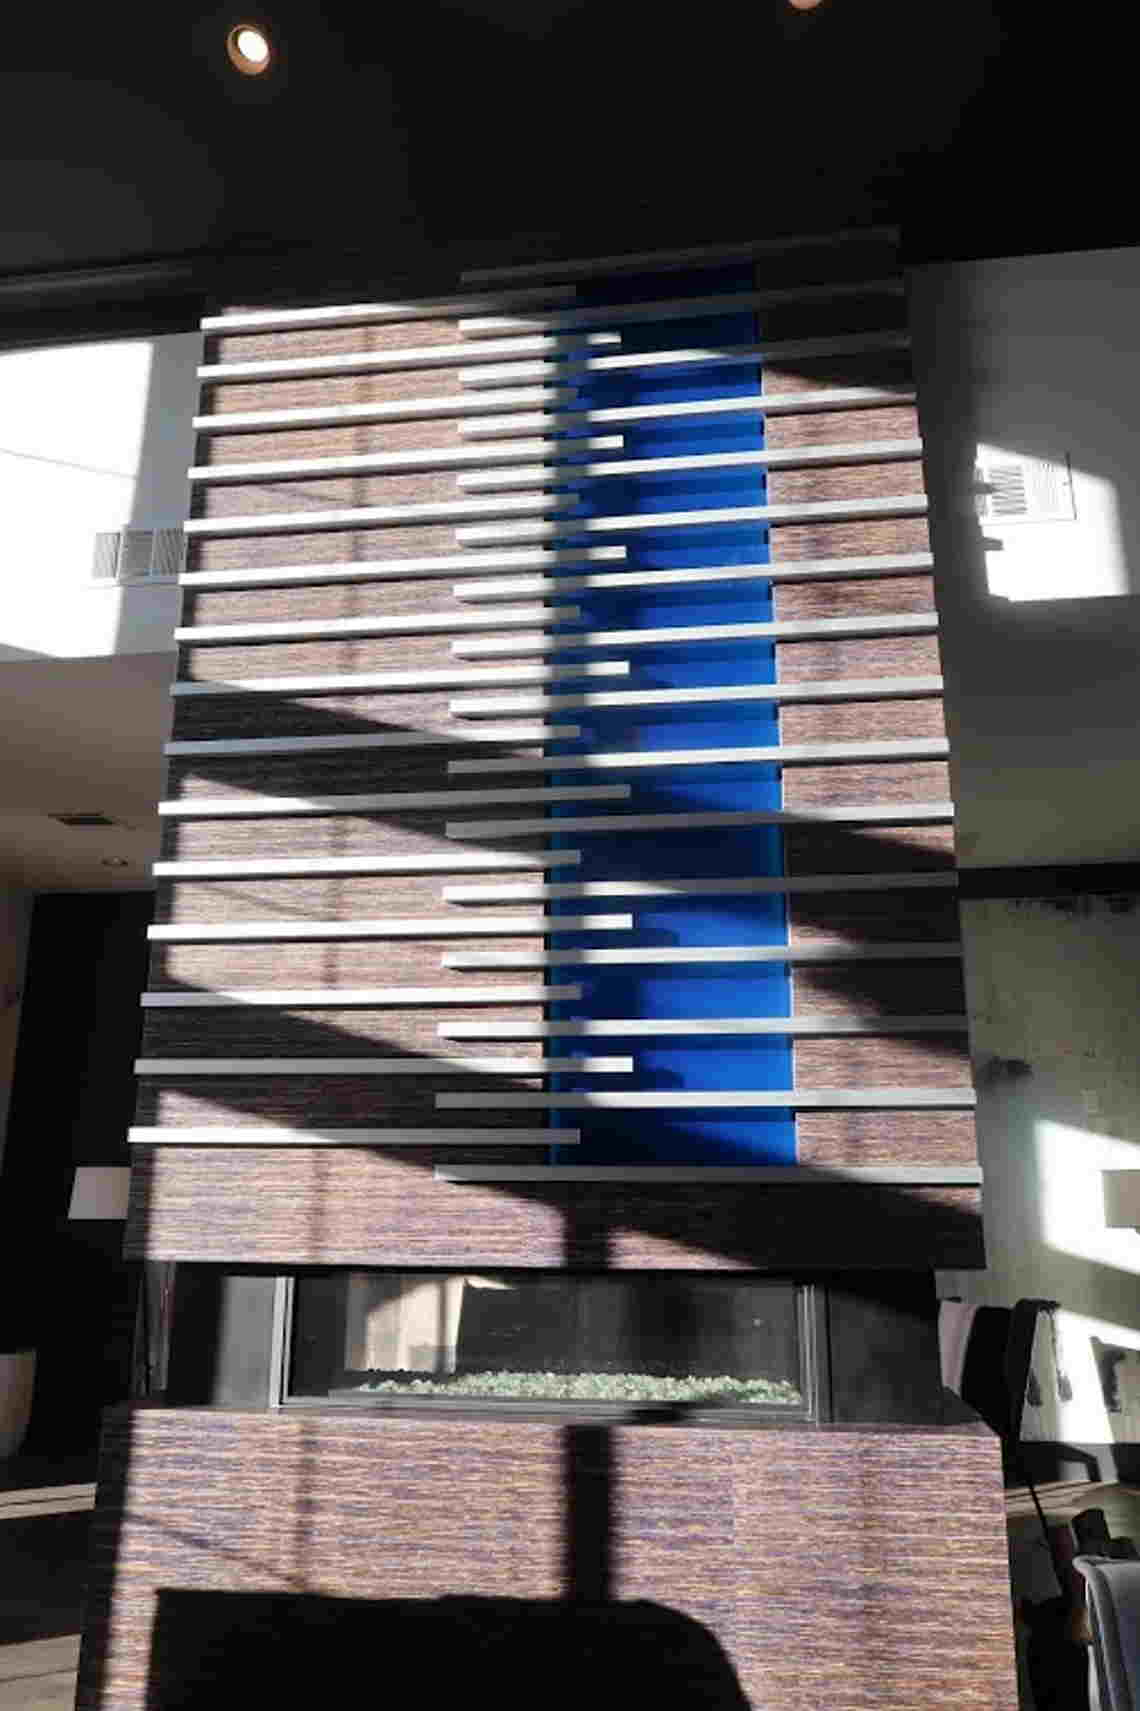 Glass Sales Amp Repair Littleton Co Highlands Ranch